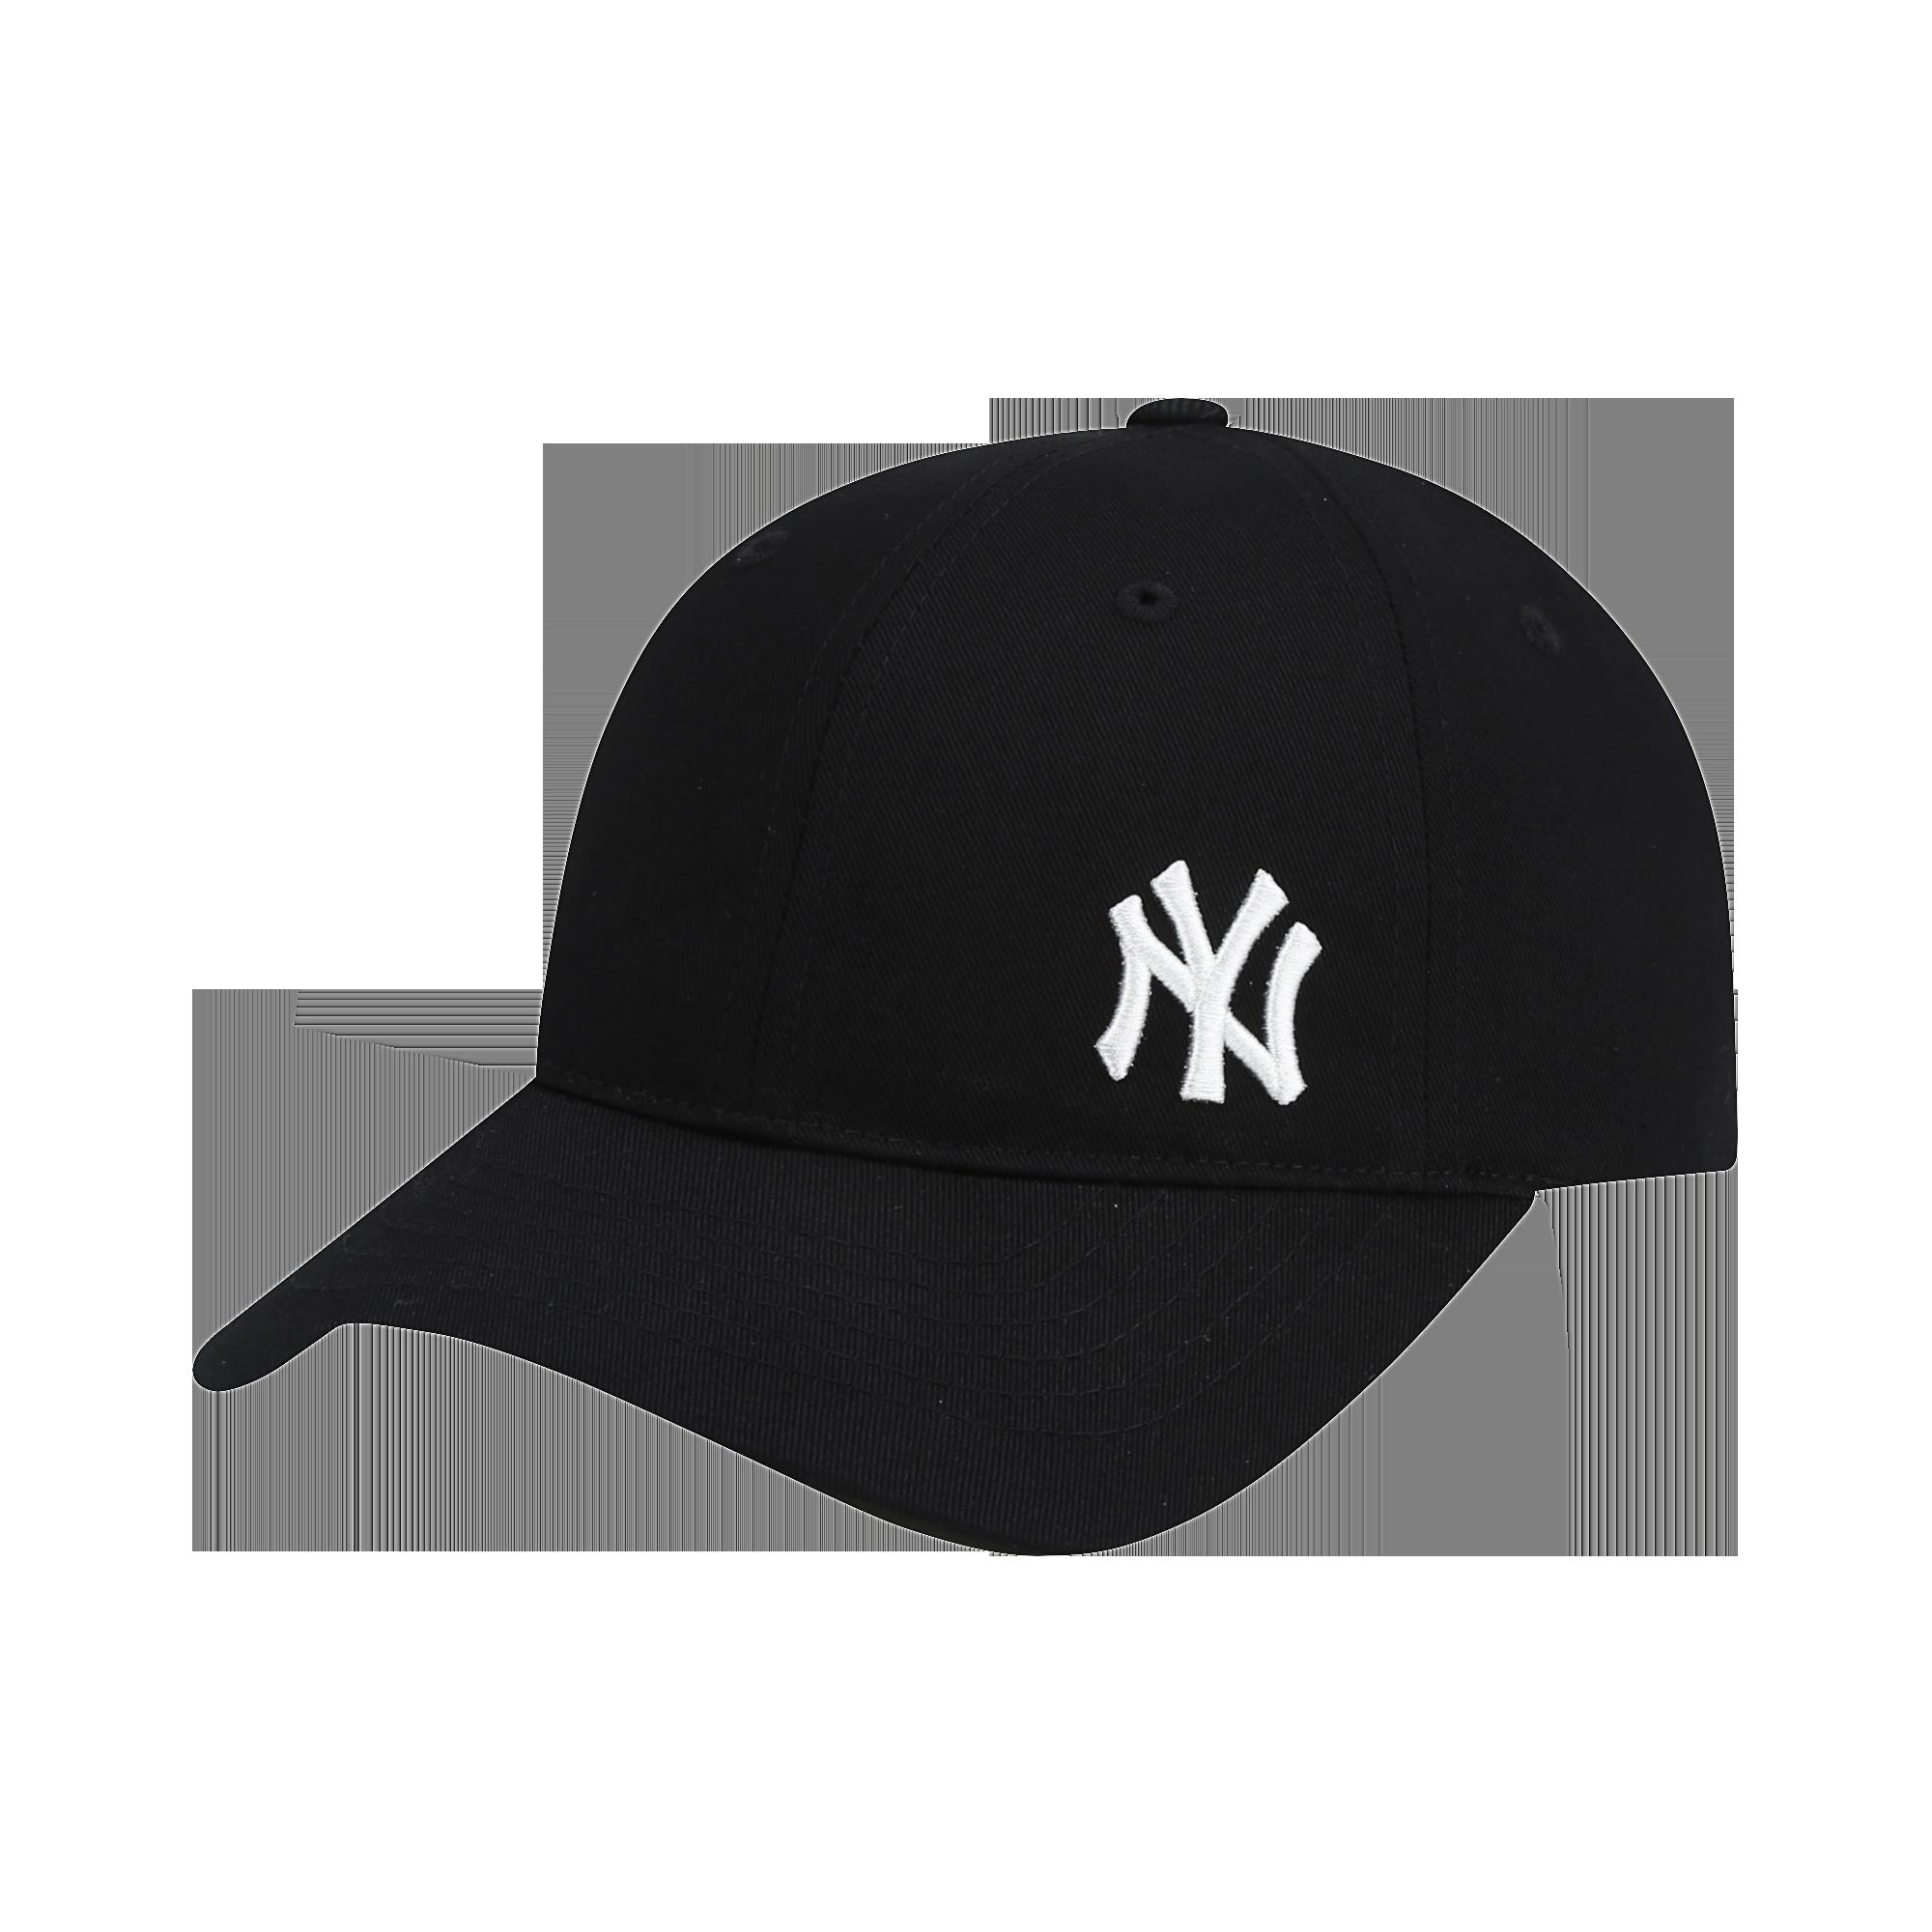 NEW YORK YANKEES SCRIPT TAIL BALL CAP